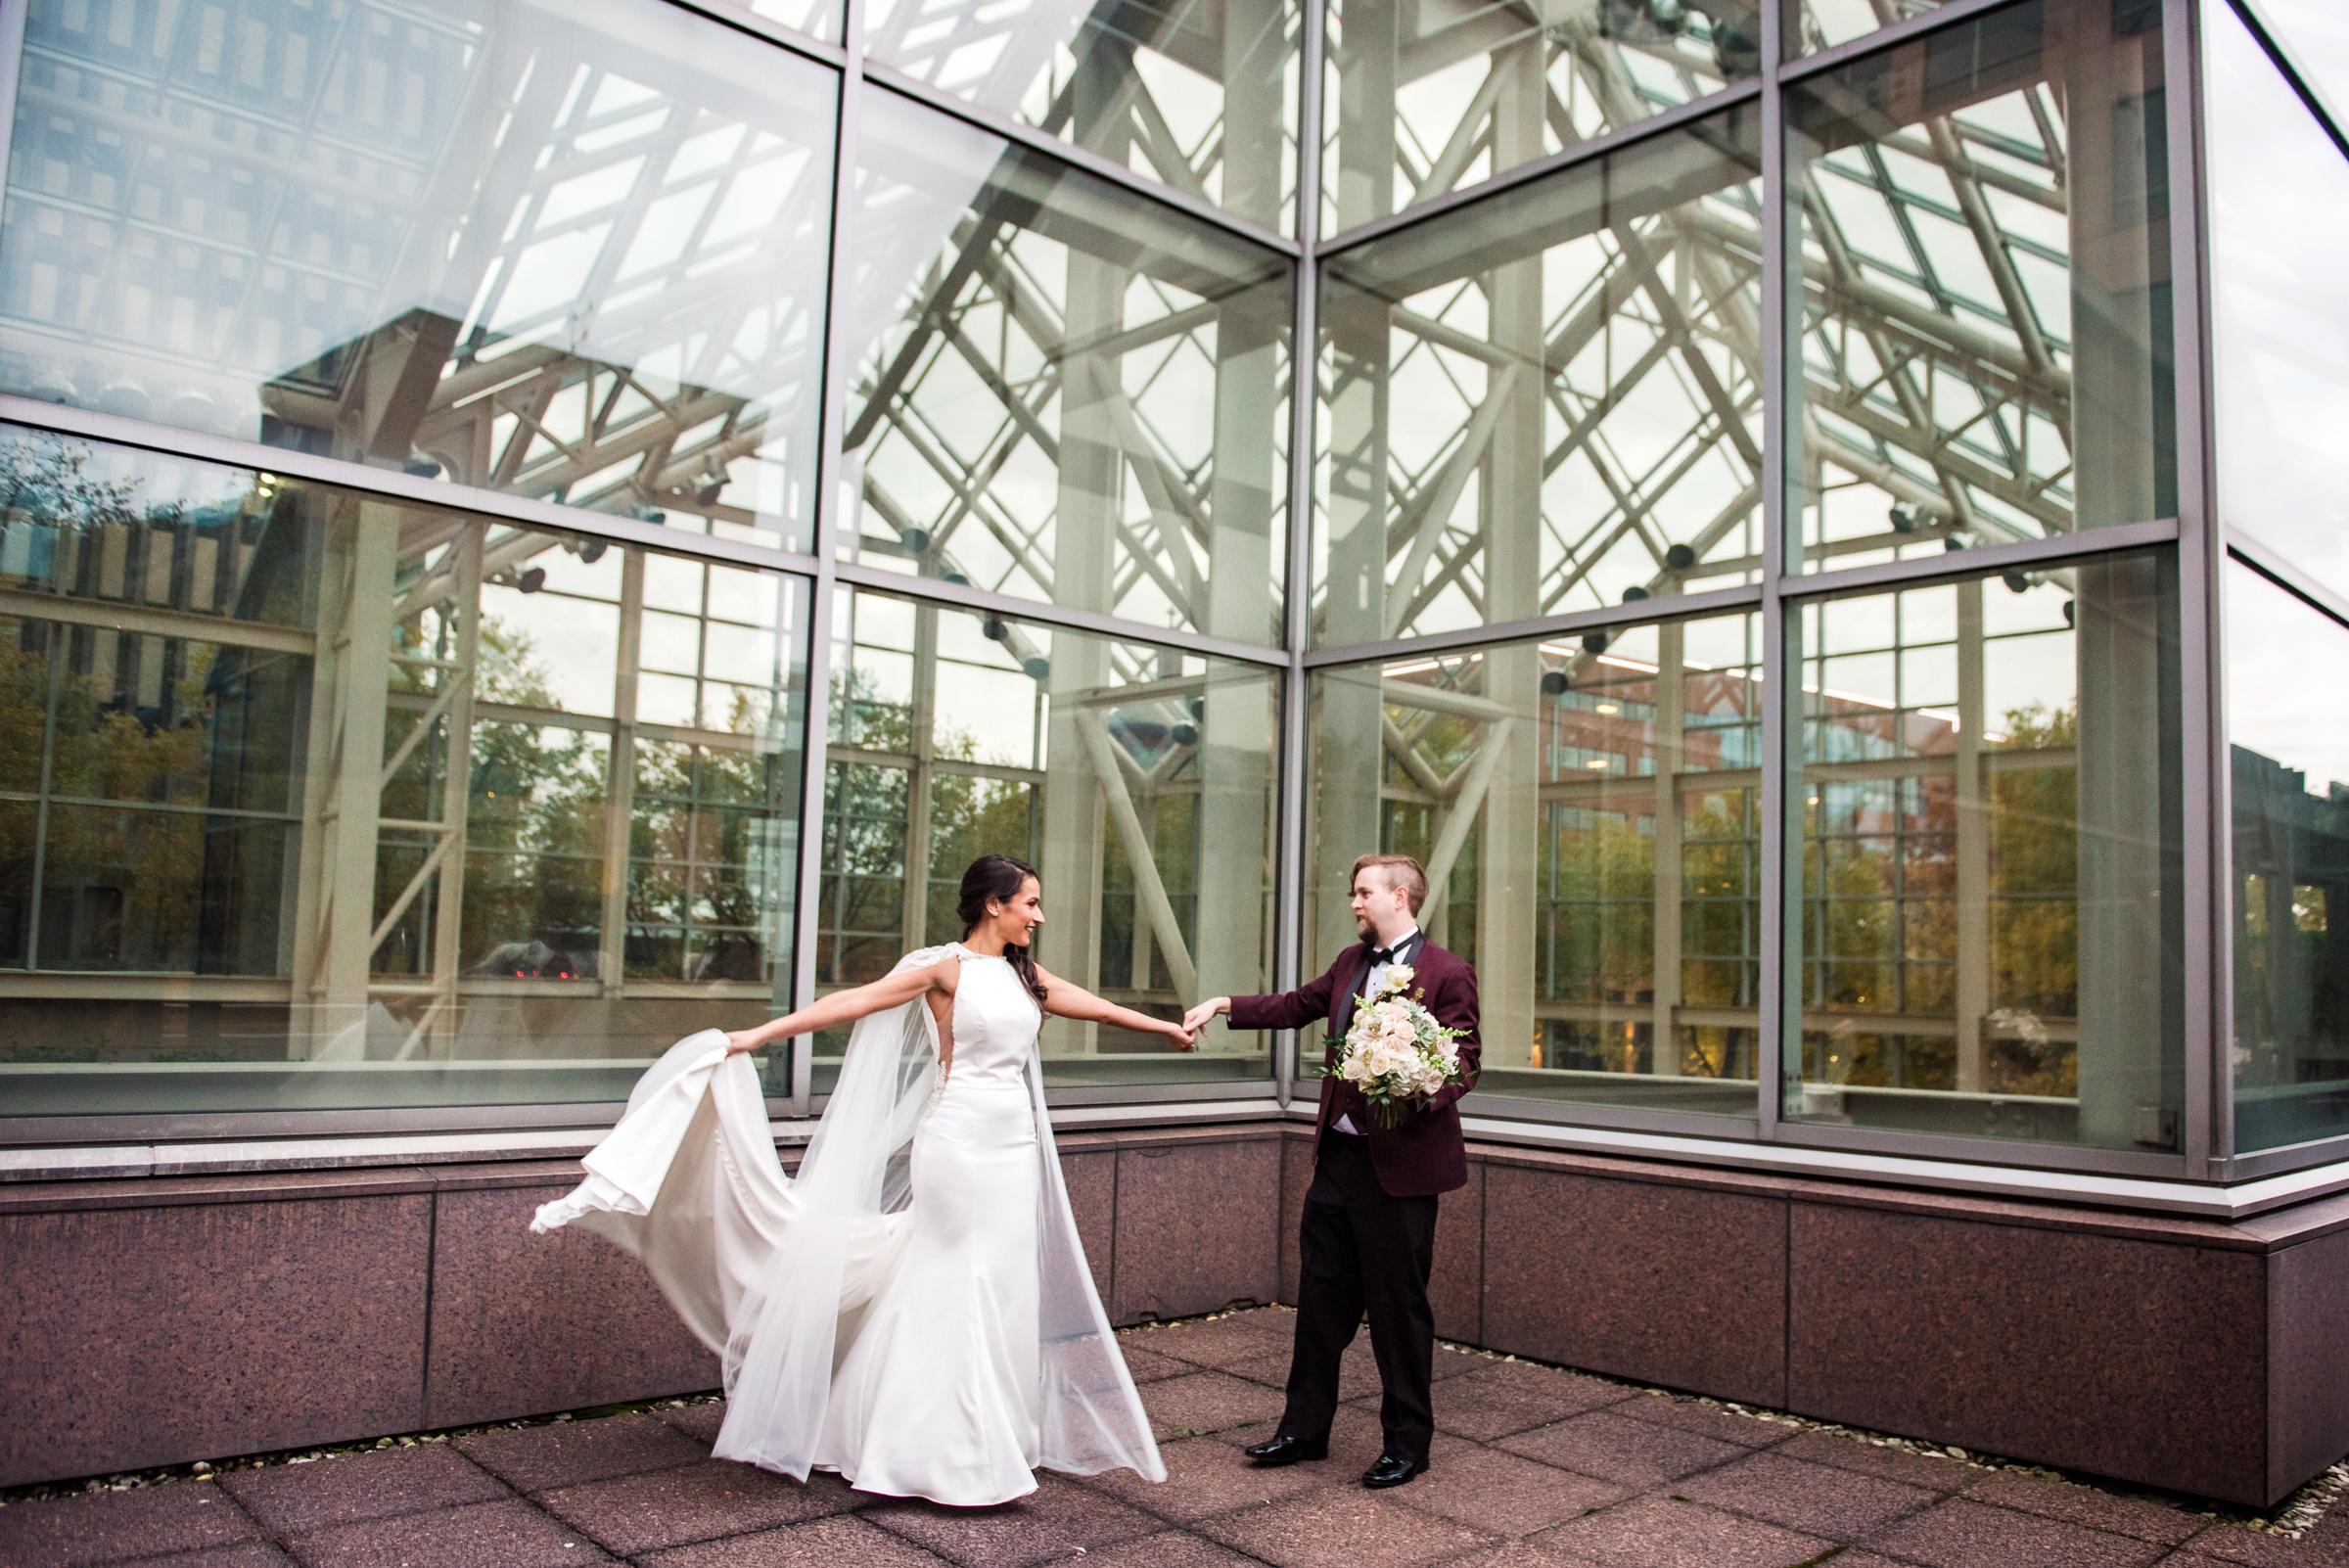 Wintergarden_by_Monroes_Rochester_Wedding_JILL_STUDIO_Rochester_NY_Photographer_174852.jpg